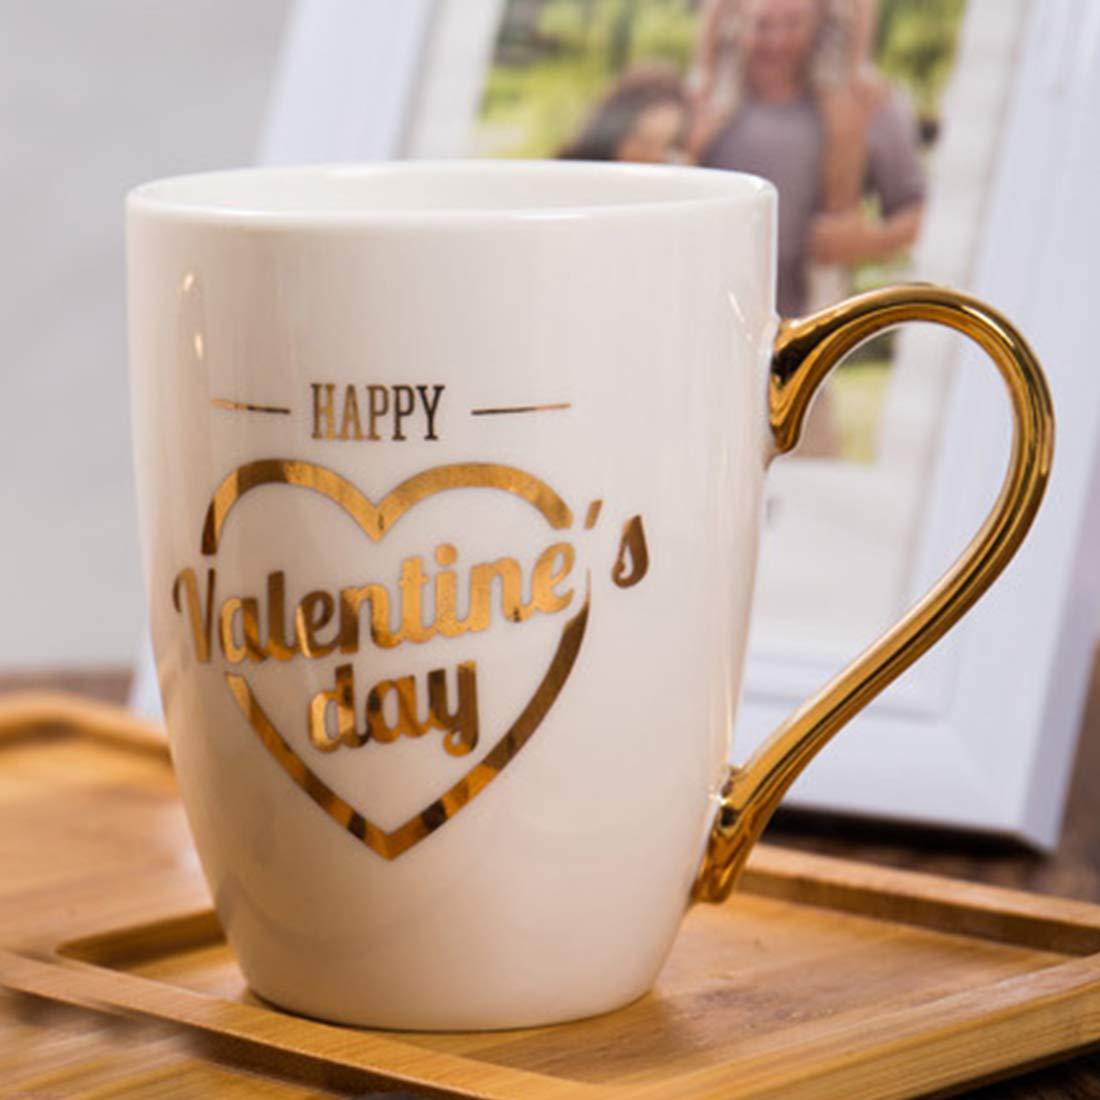 BonZeaL Valentine Mug Ceramic Coffee Mugs Tea Cups Birthday Gifts For Girlfriend Boyfriend Husband Wife Quirky Her Him Boys Girls Couple